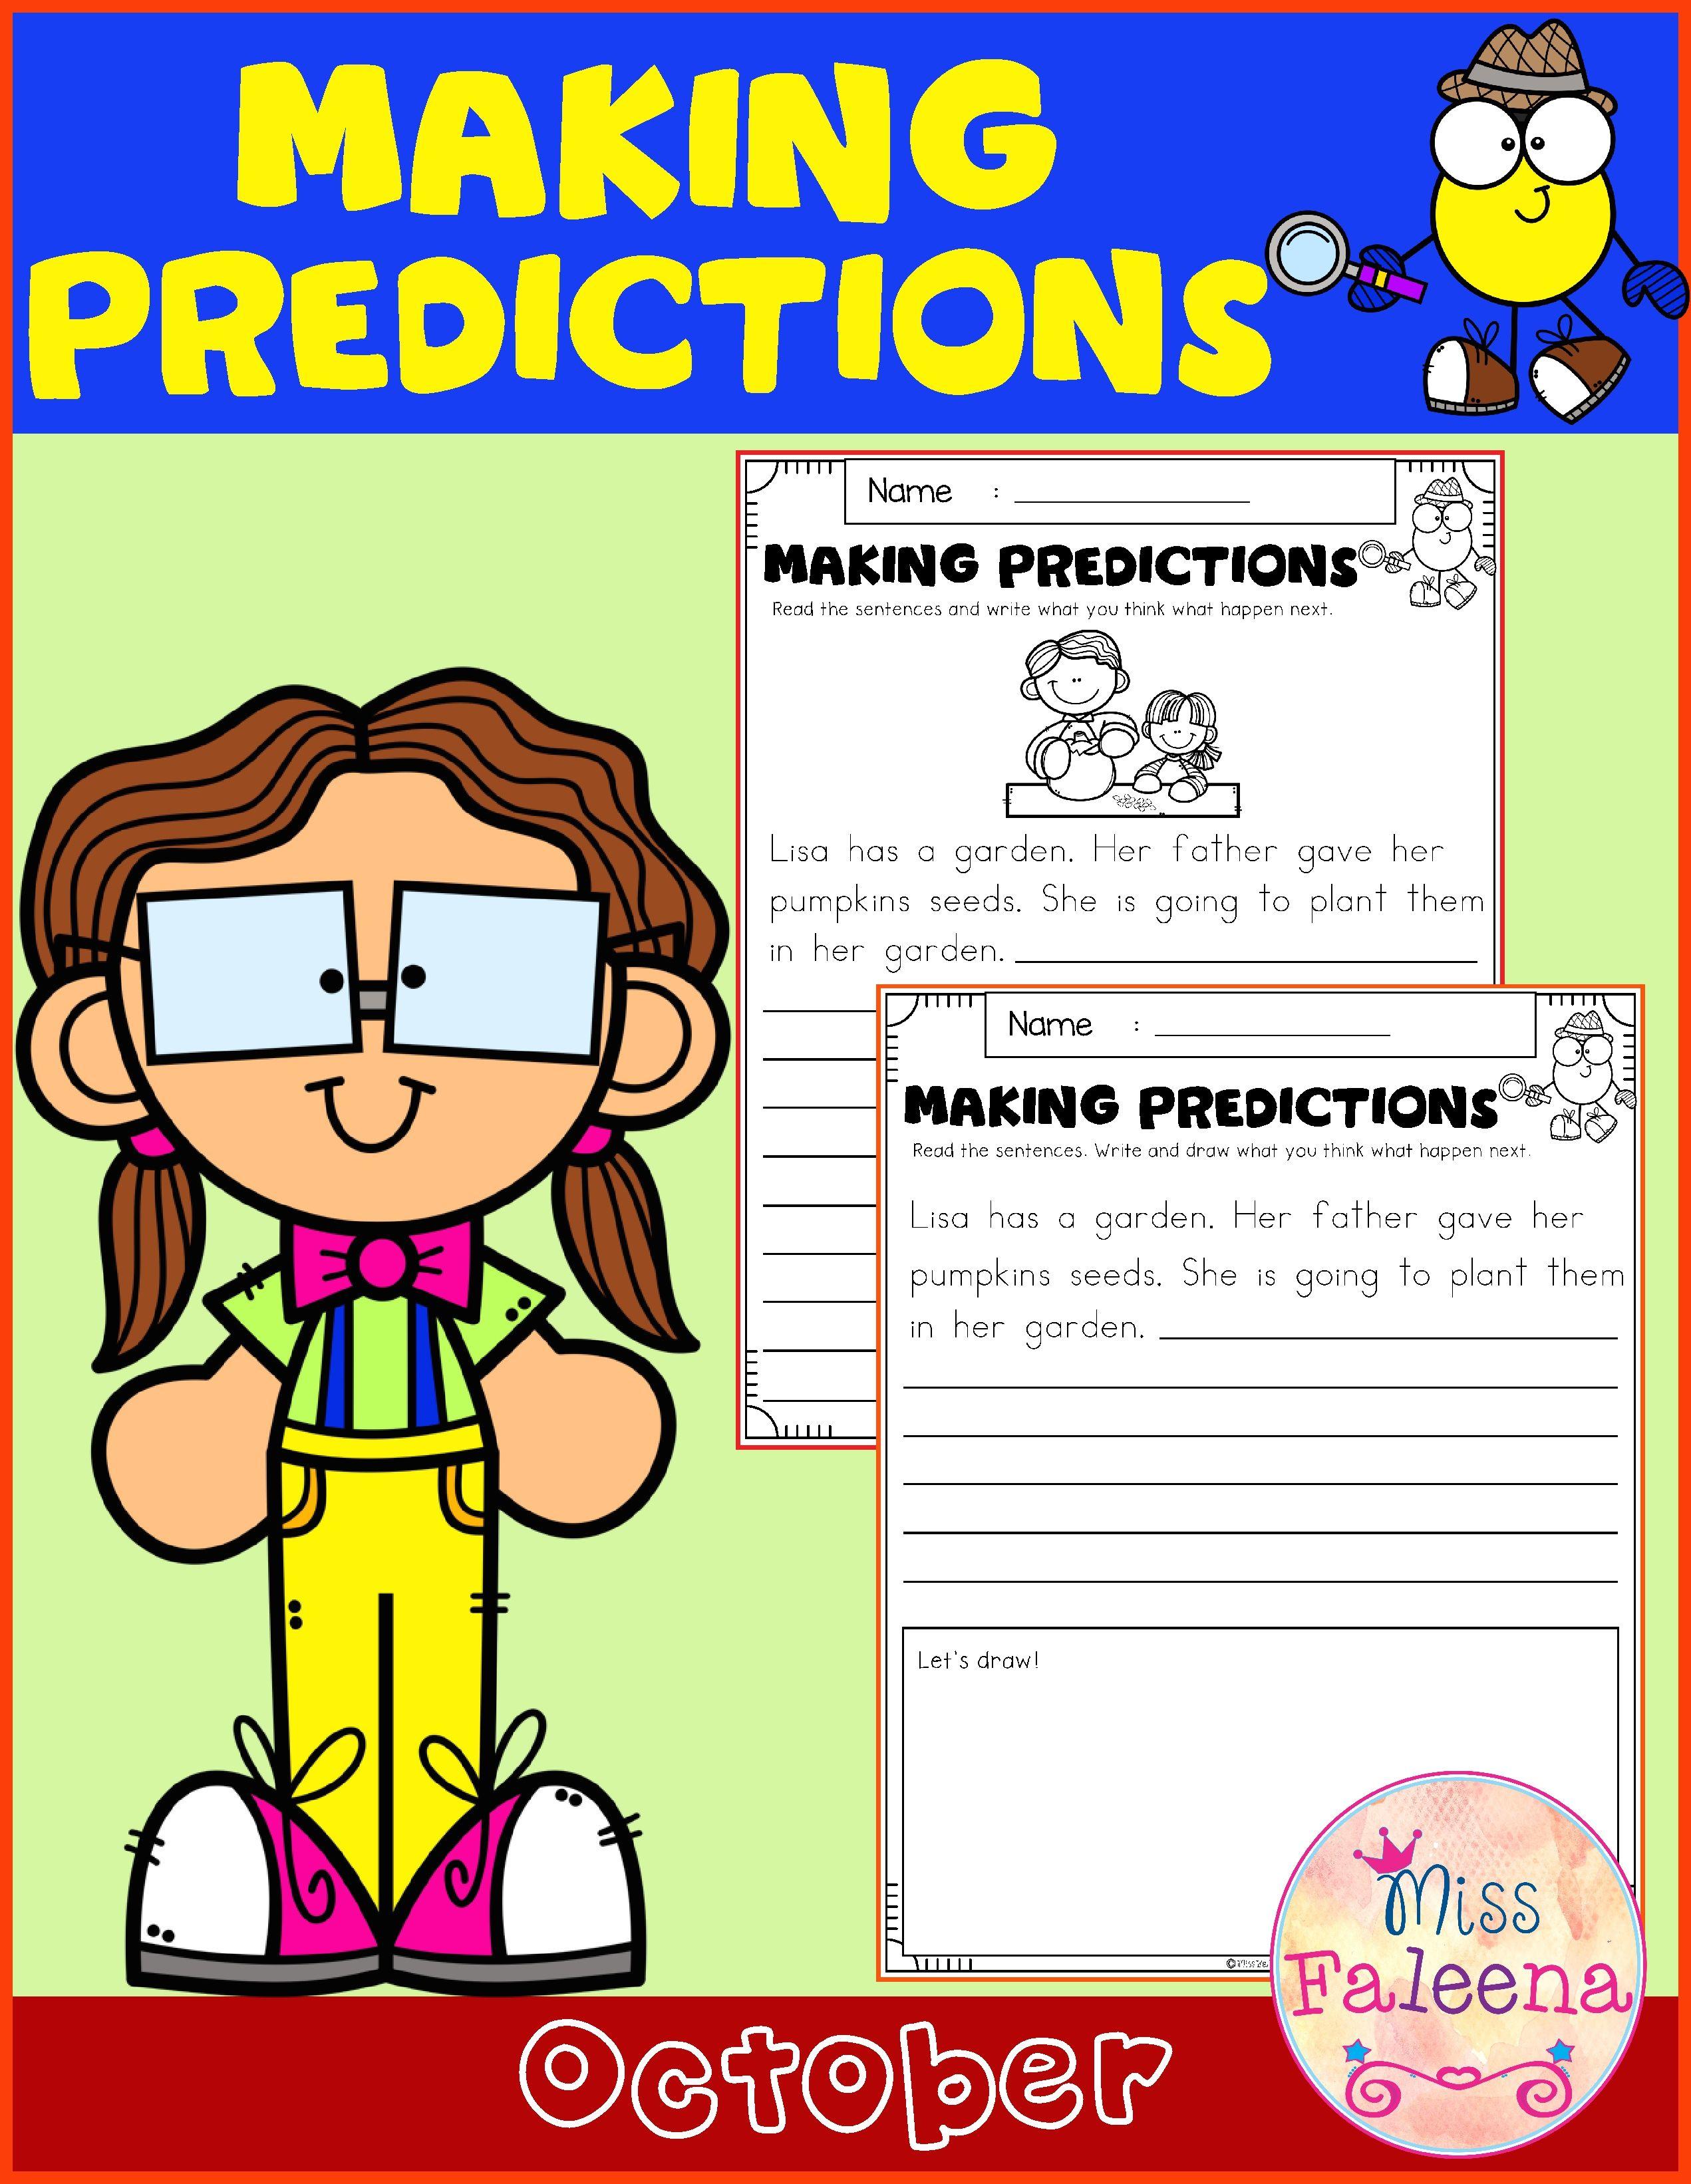 October Making Predictions